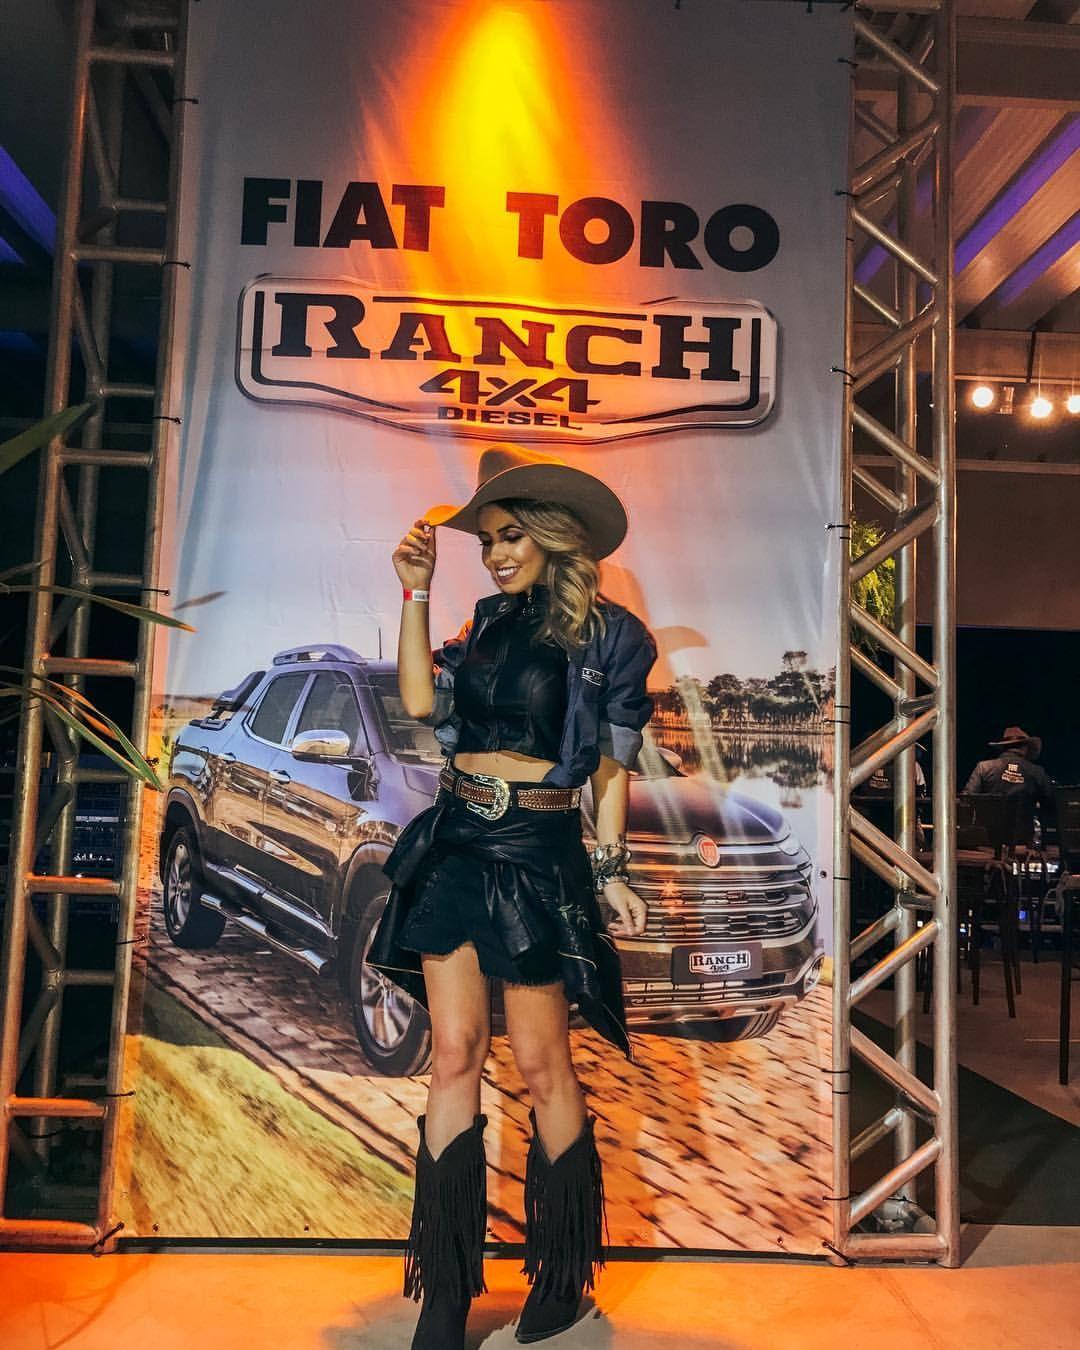 chapeu  country  cowgirl  rodeio  festa  peao  sertanejo  look  bota   franja  cinto  cinturao  couro  cropped  short 5dbcbc6f0180